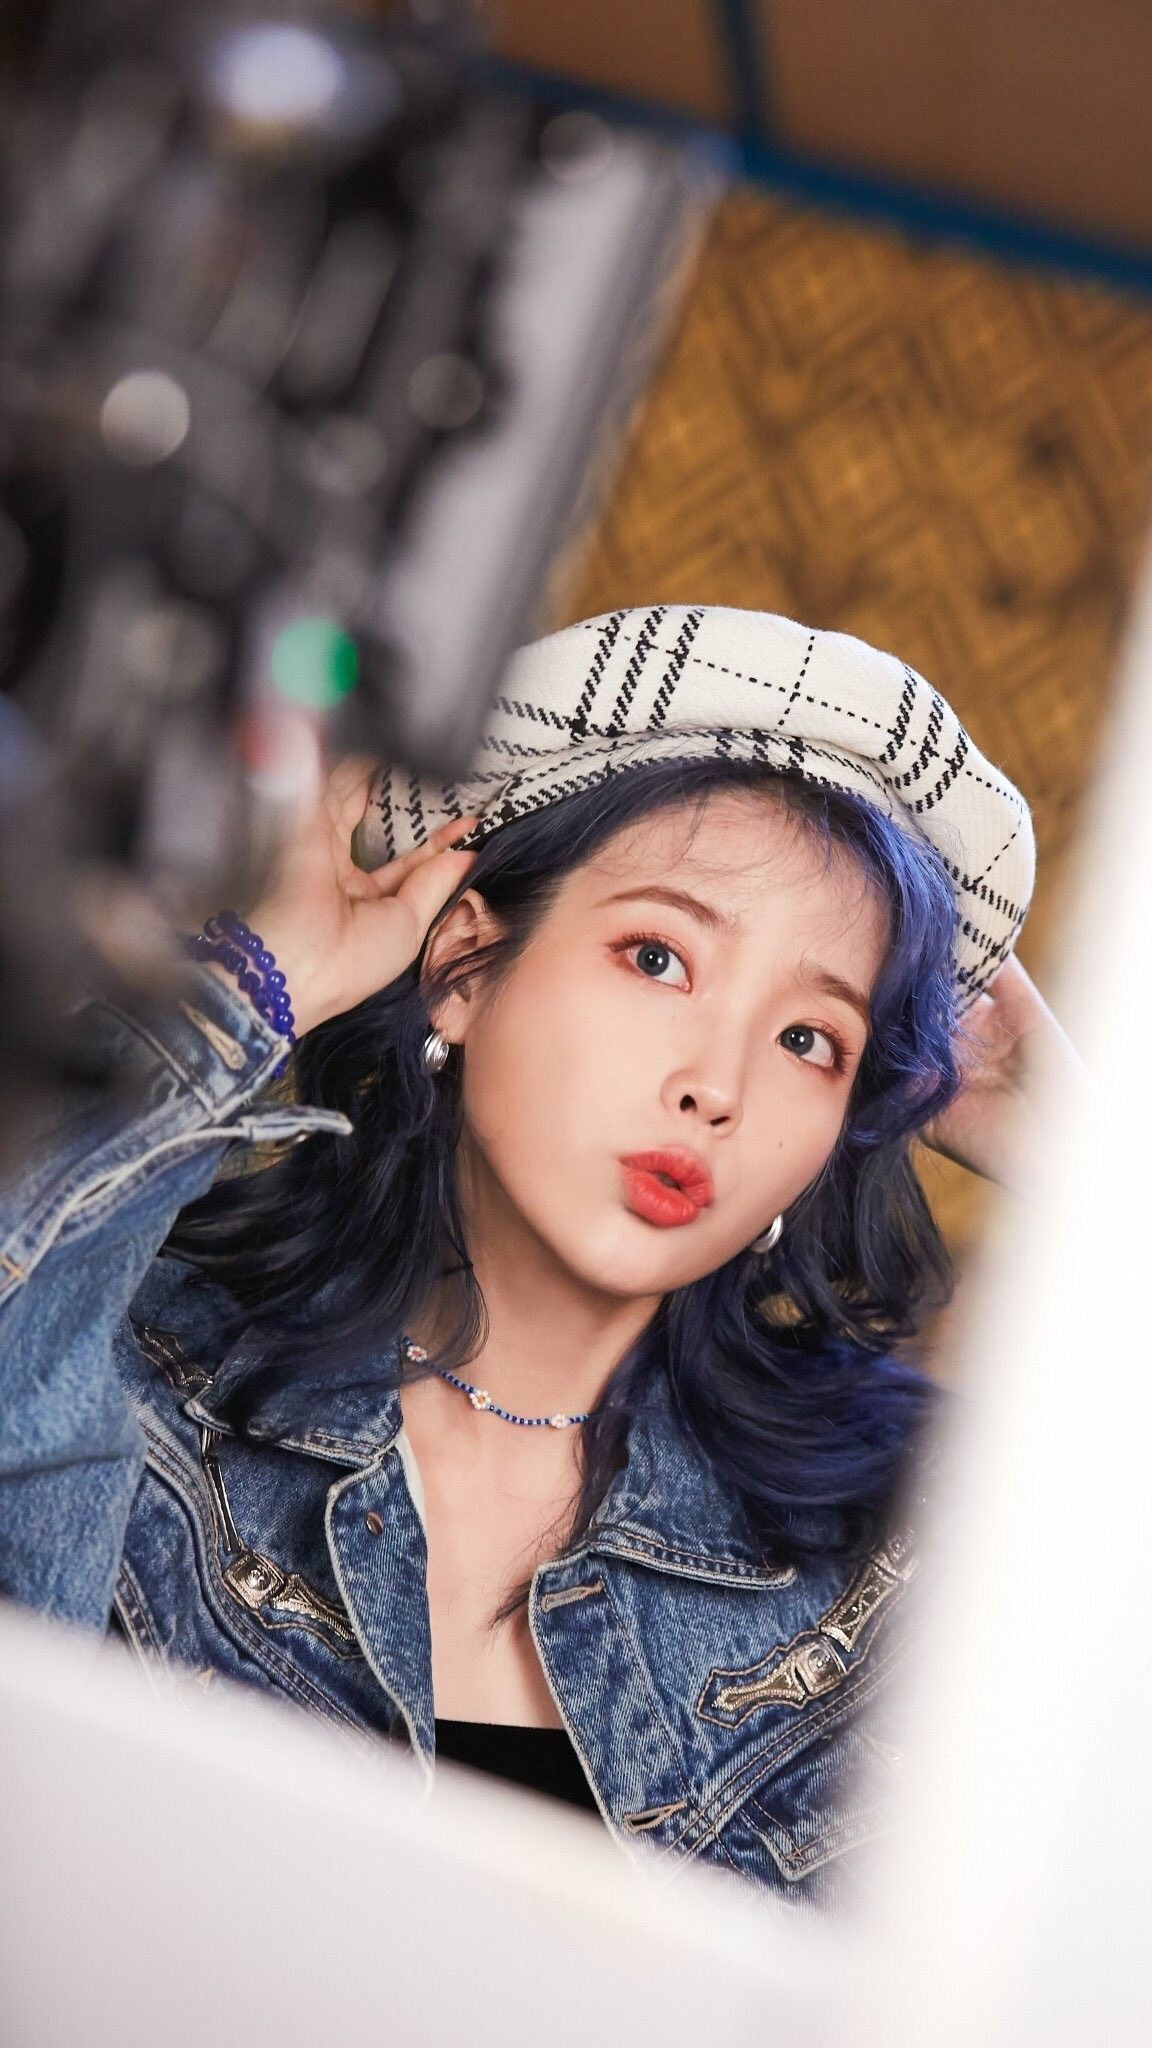 Iu Lovepoem Blueming Wallpaper Aktris Selebriti Gadis Korea